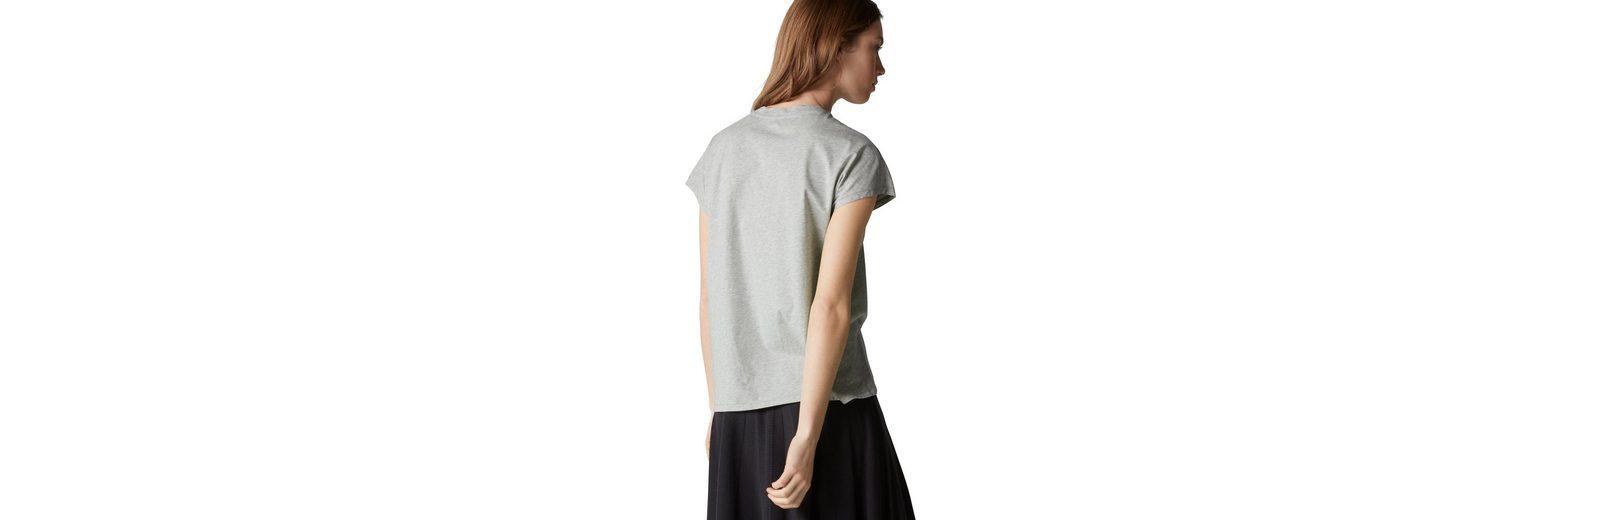 Marc O'Polo T-Shirt Billig Footlocker Auslass Für Schön A4lEVlGY